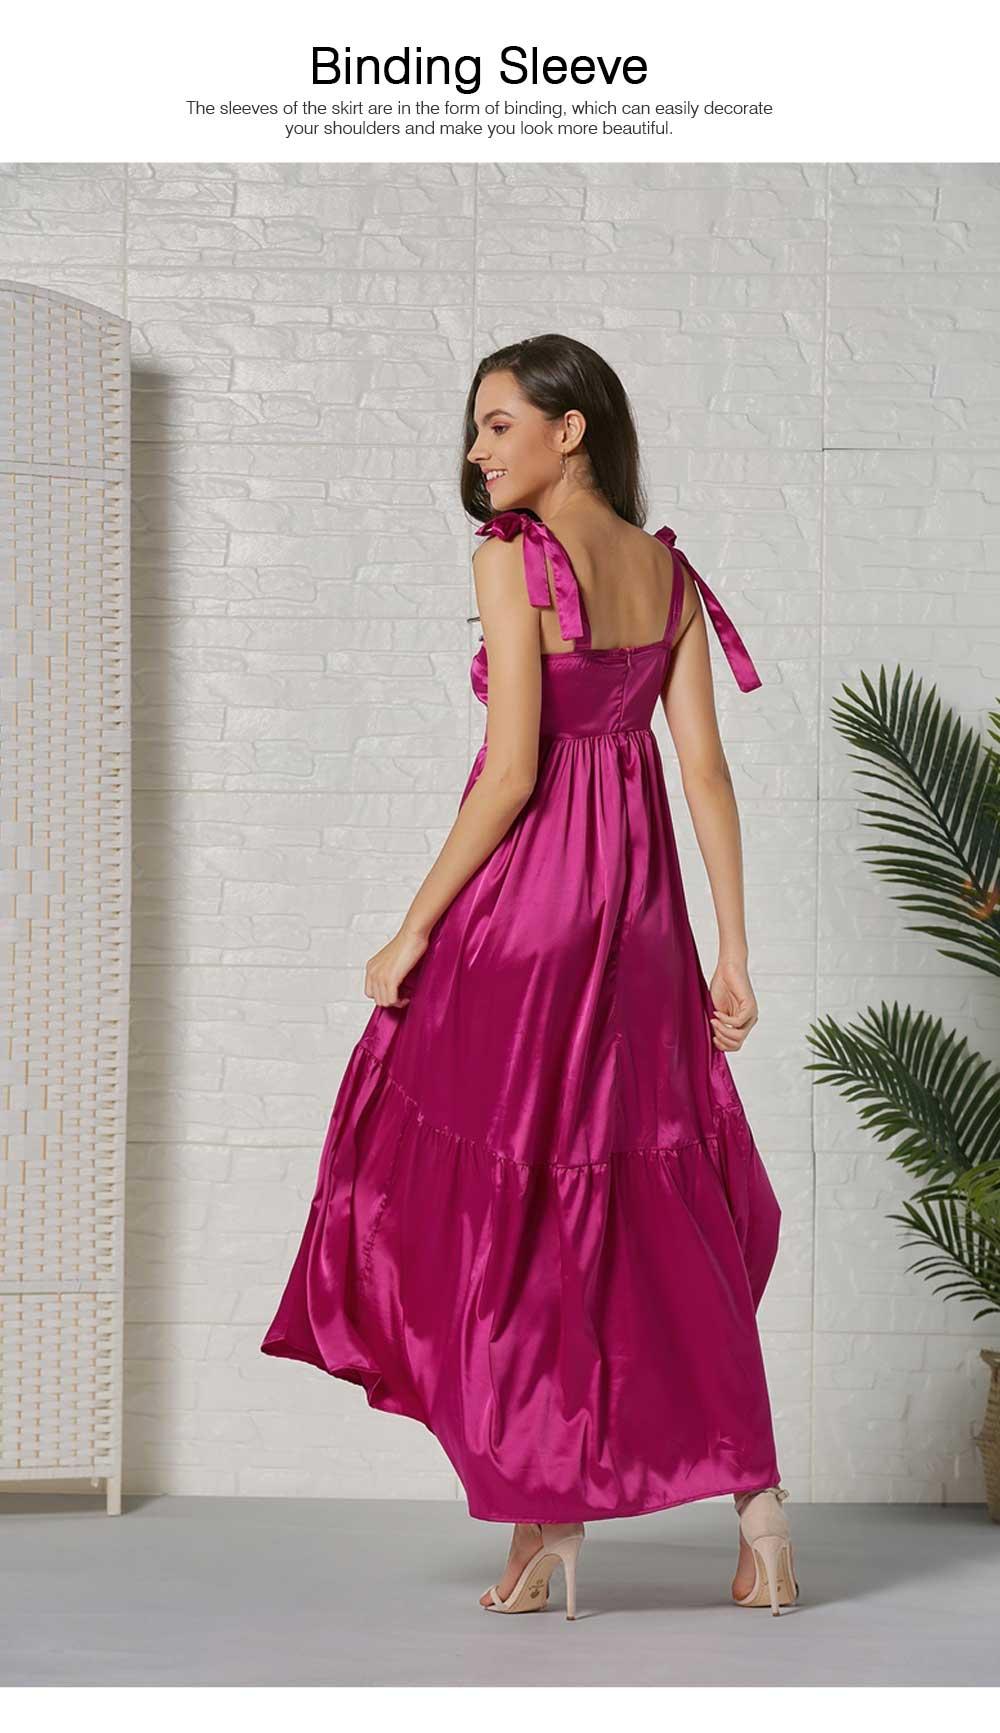 Lady Bohemian Dress Satin Flapper Hem Petticoat Binding Non-sleeve Long Purple Skirt Spring Summer for Women 3